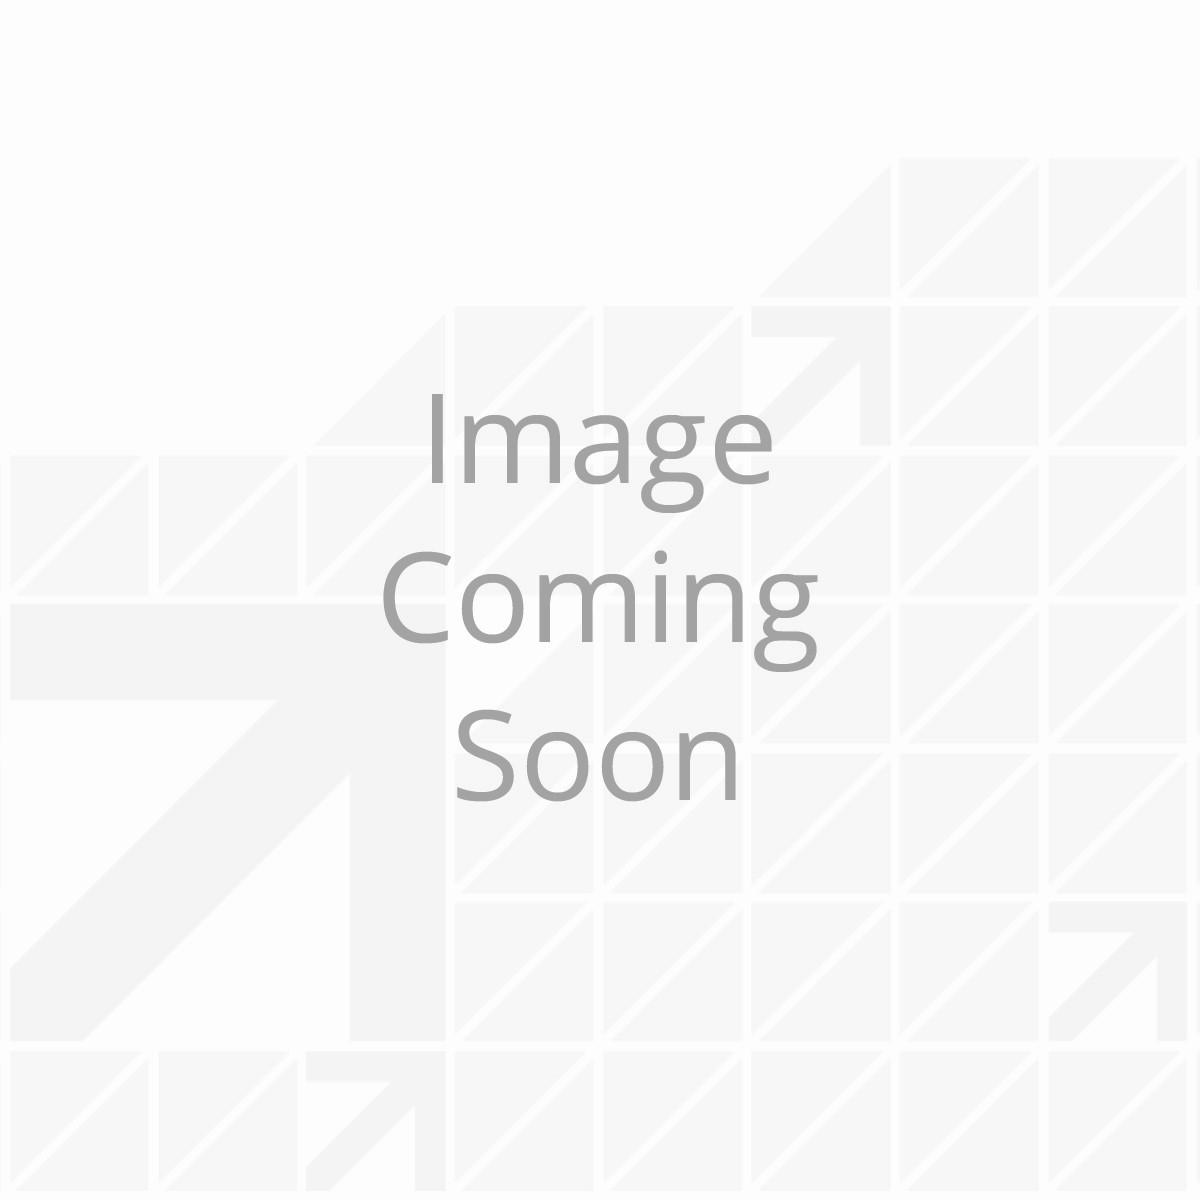 50A Cordset - Various Options